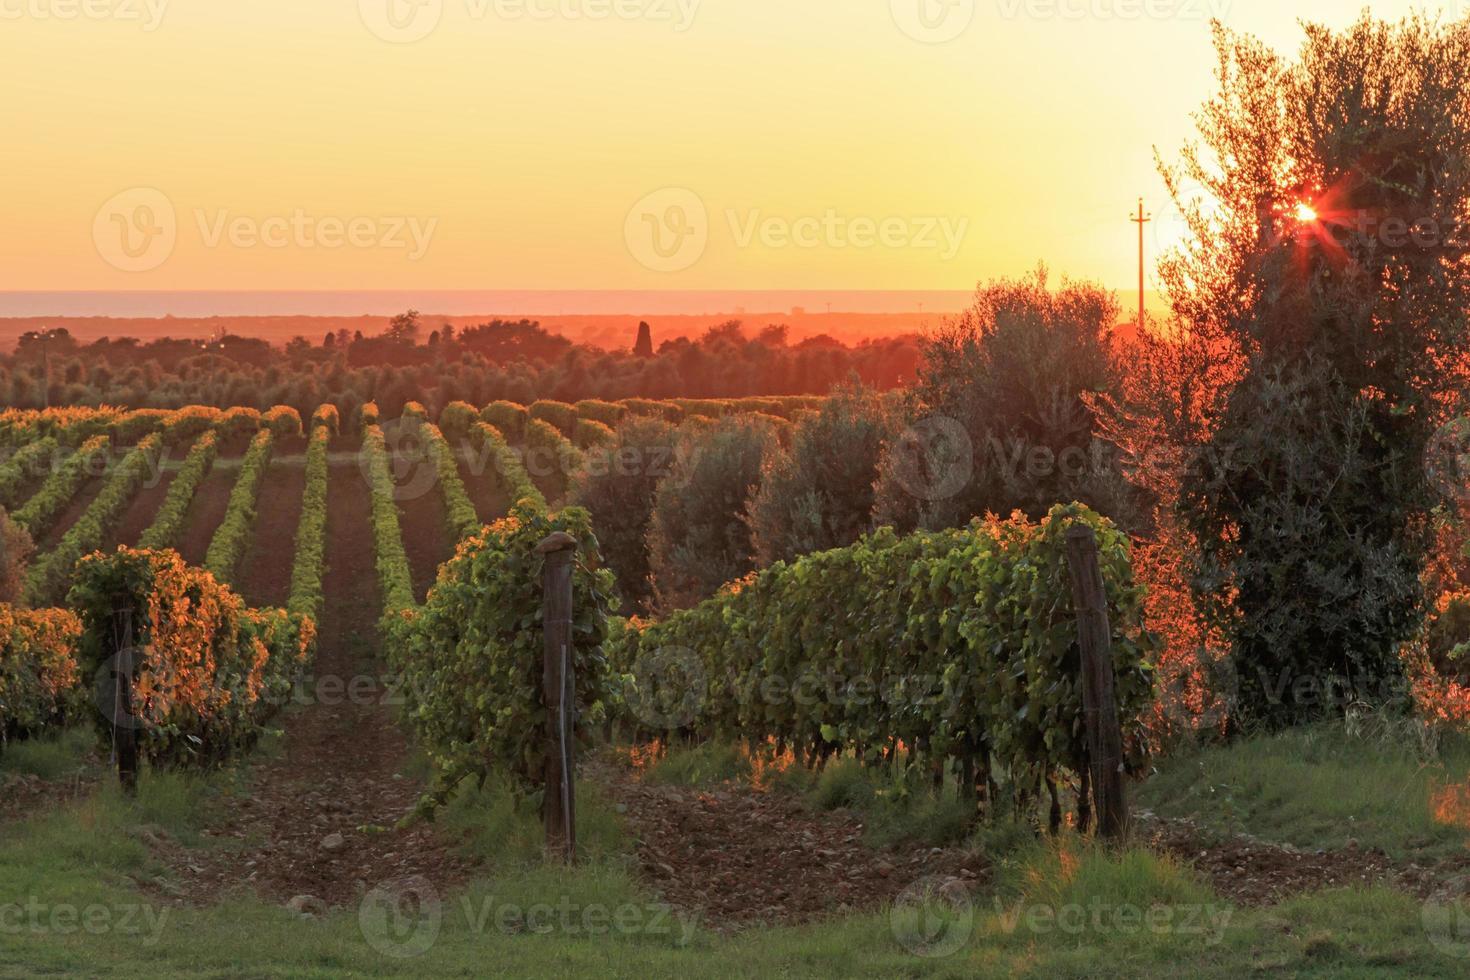 solnedgång i en vingård, Toscana - Italien foto